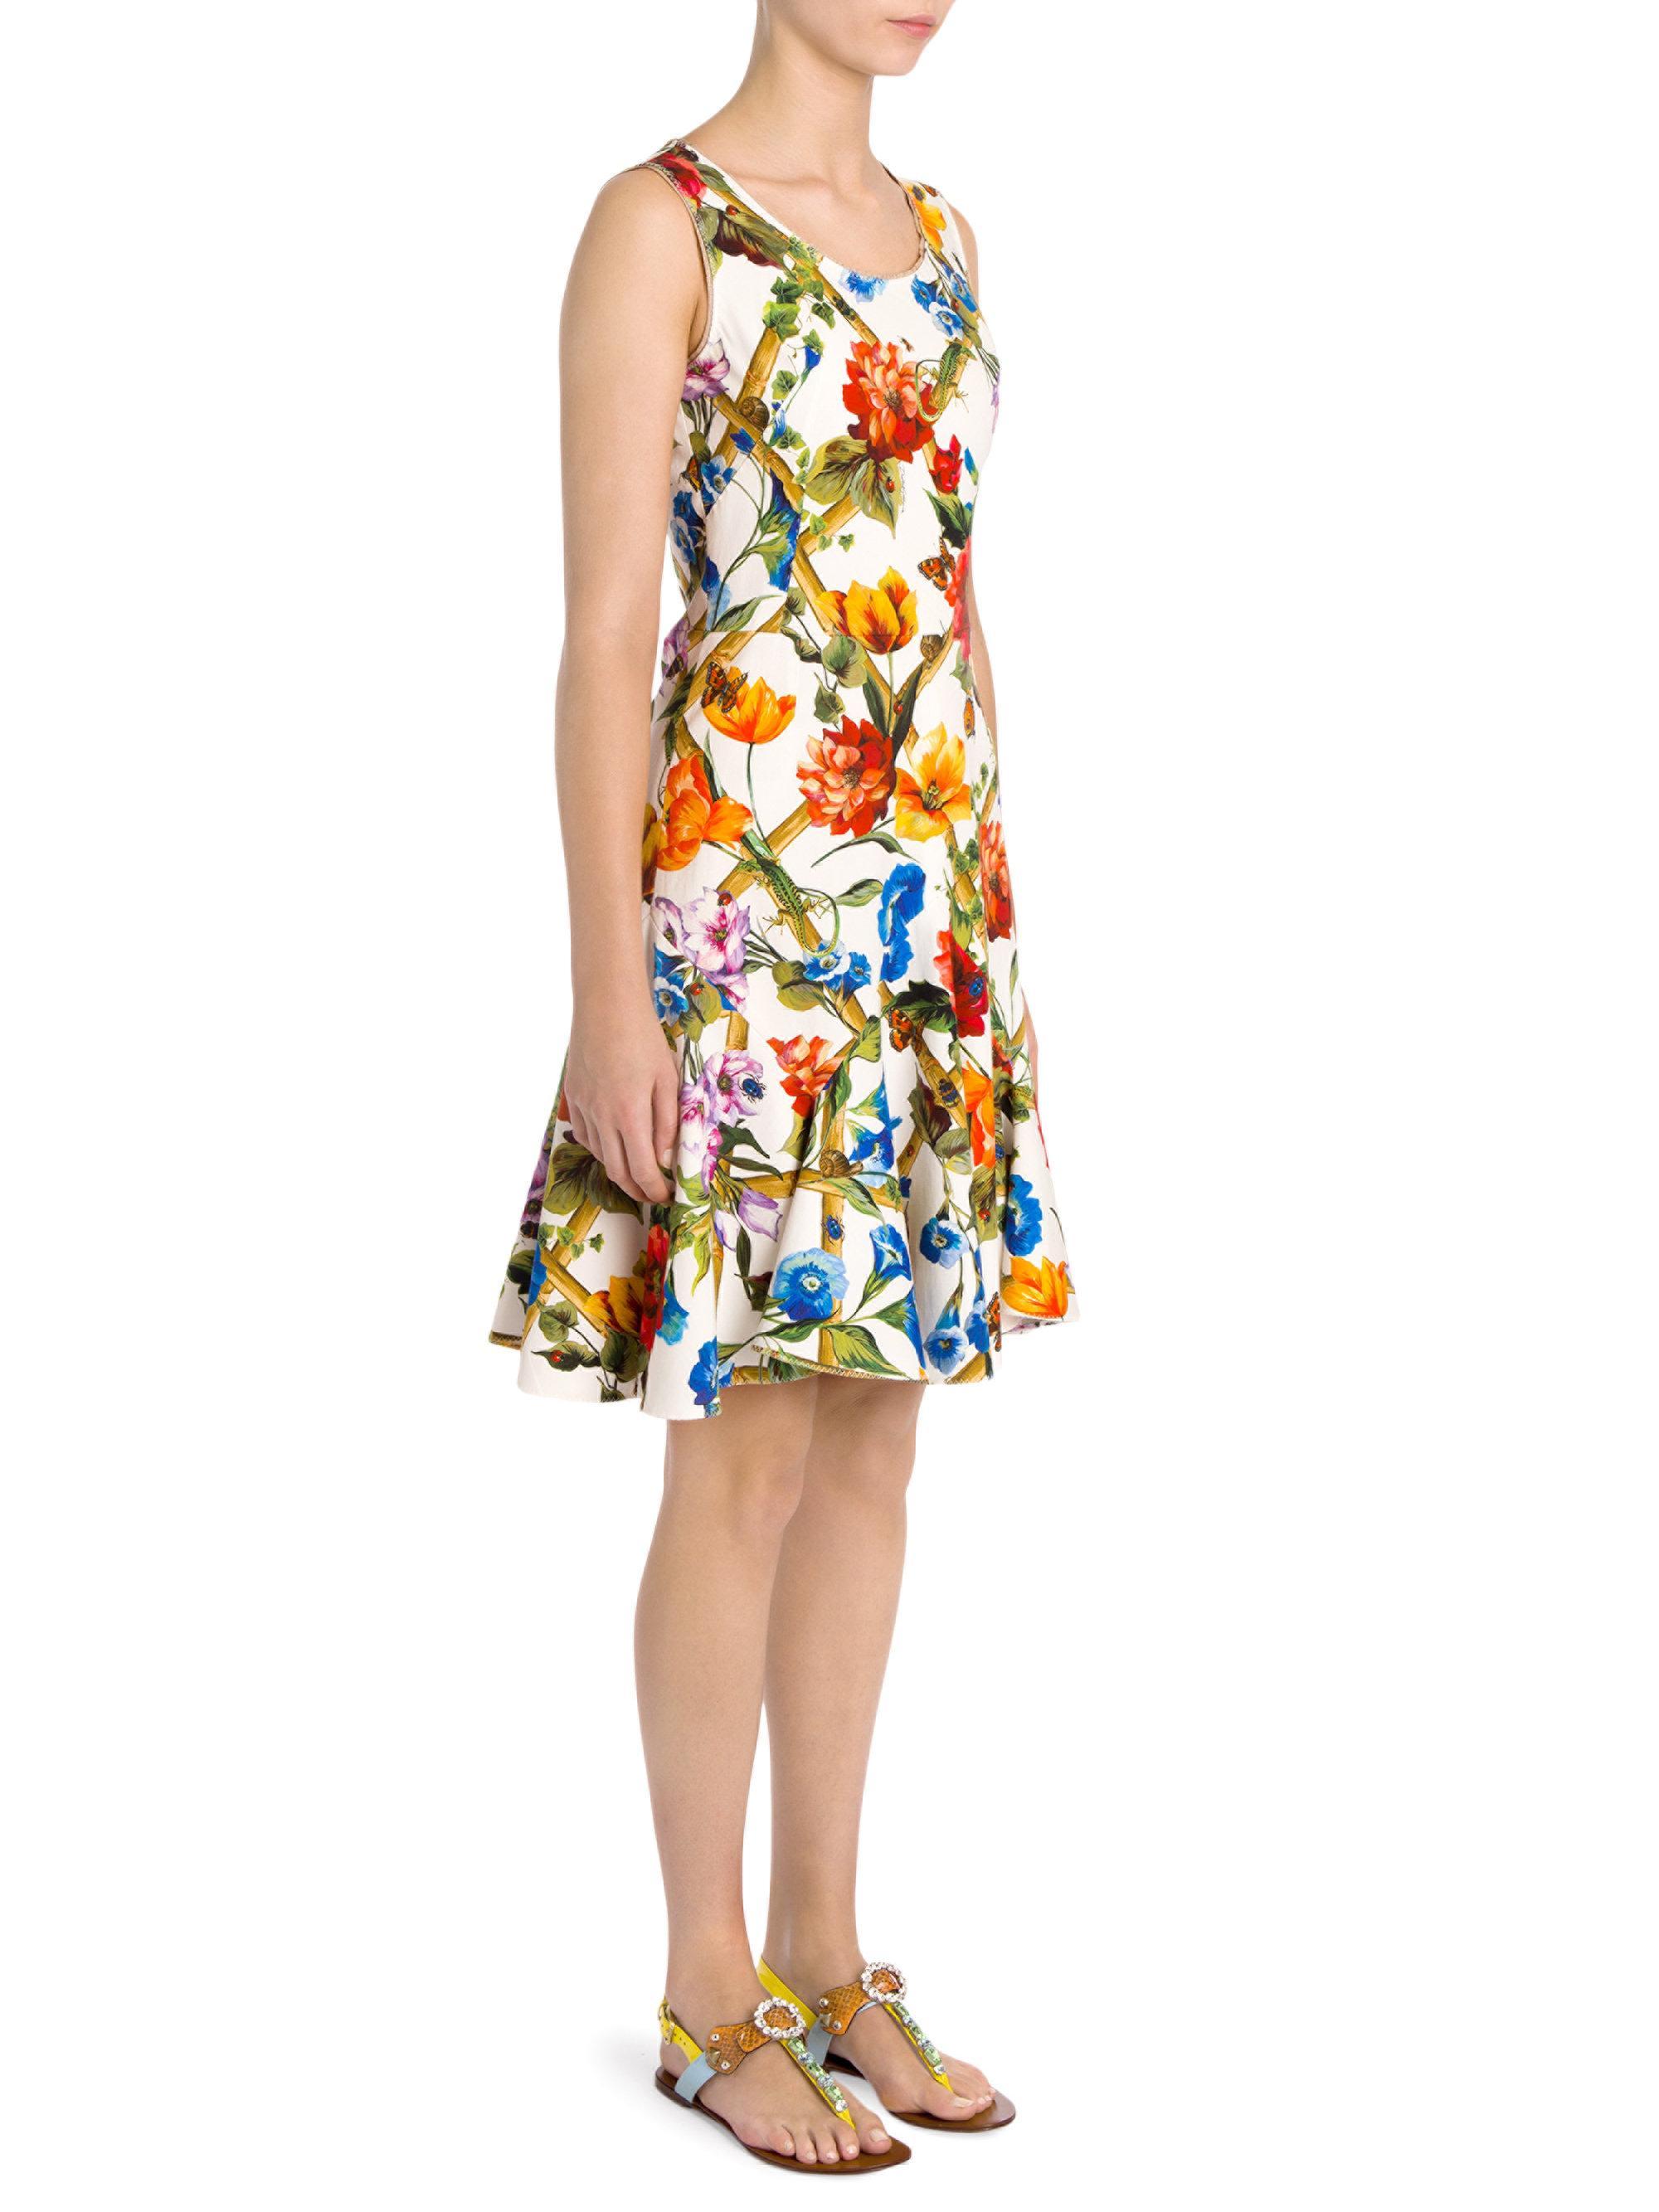 b7c45e8e3e5 Dolce   Gabbana Floral Bamboo Print Dress - Lyst